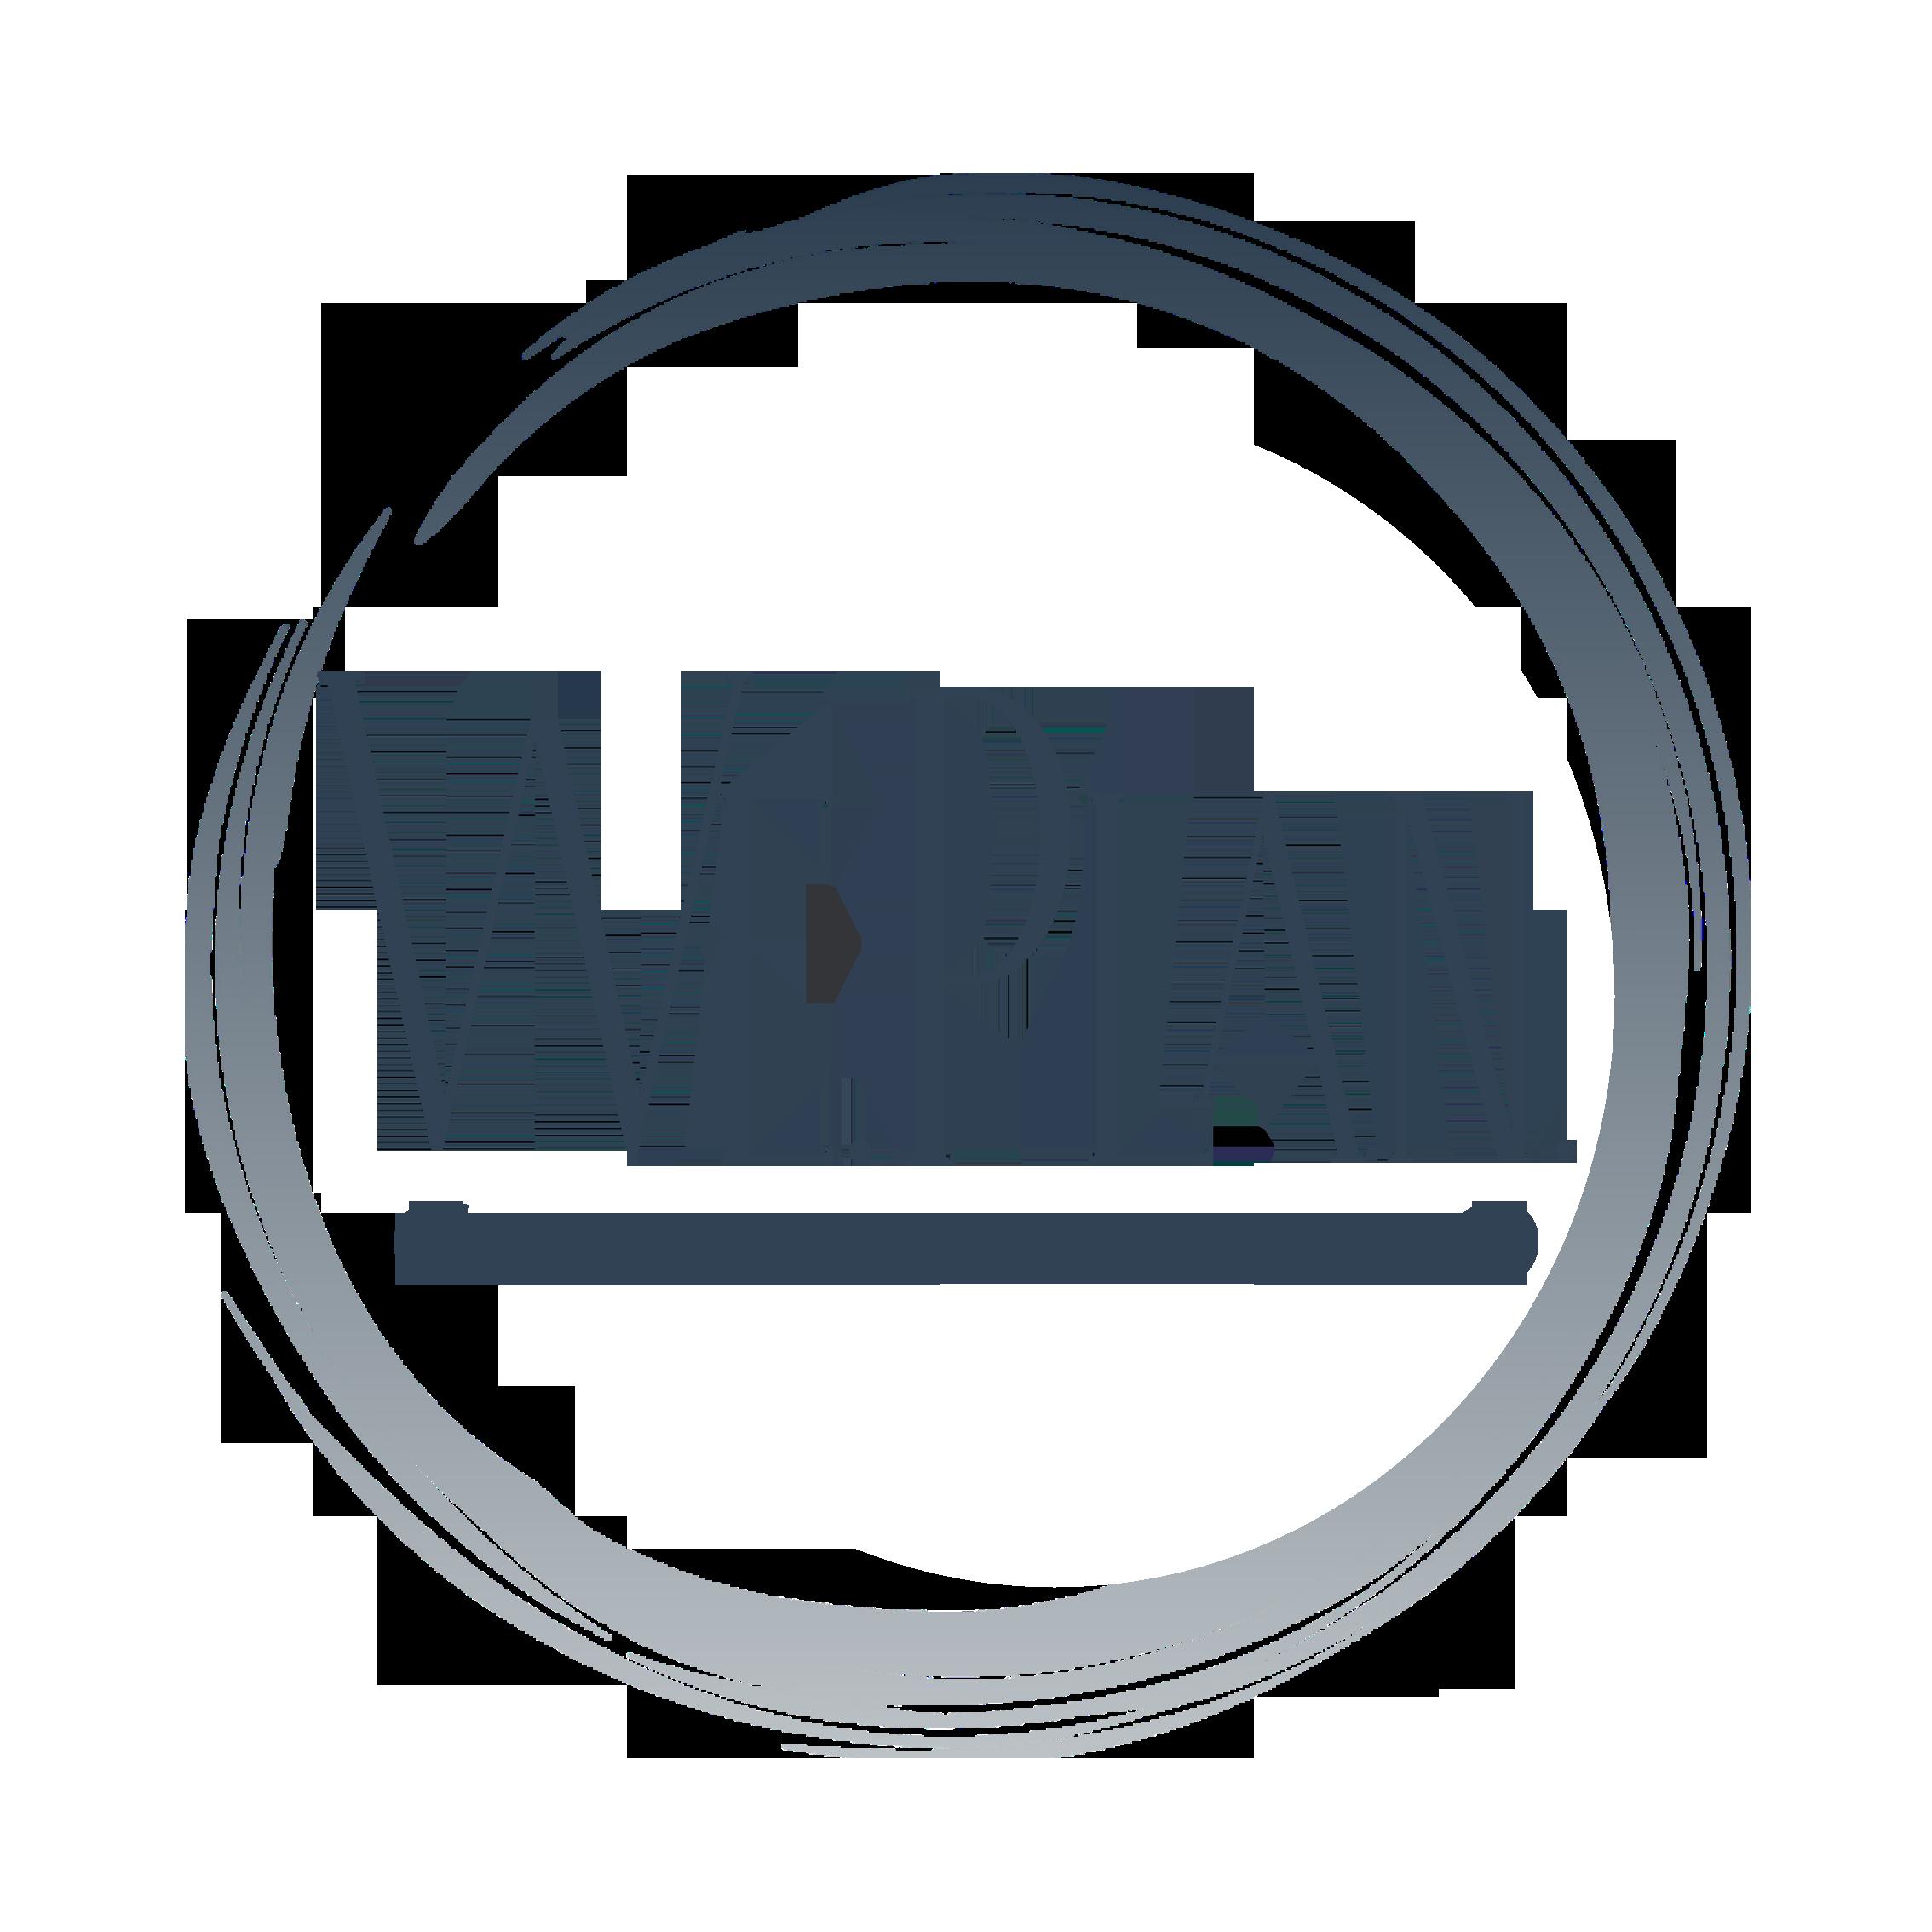 We. Plan Confcommercio